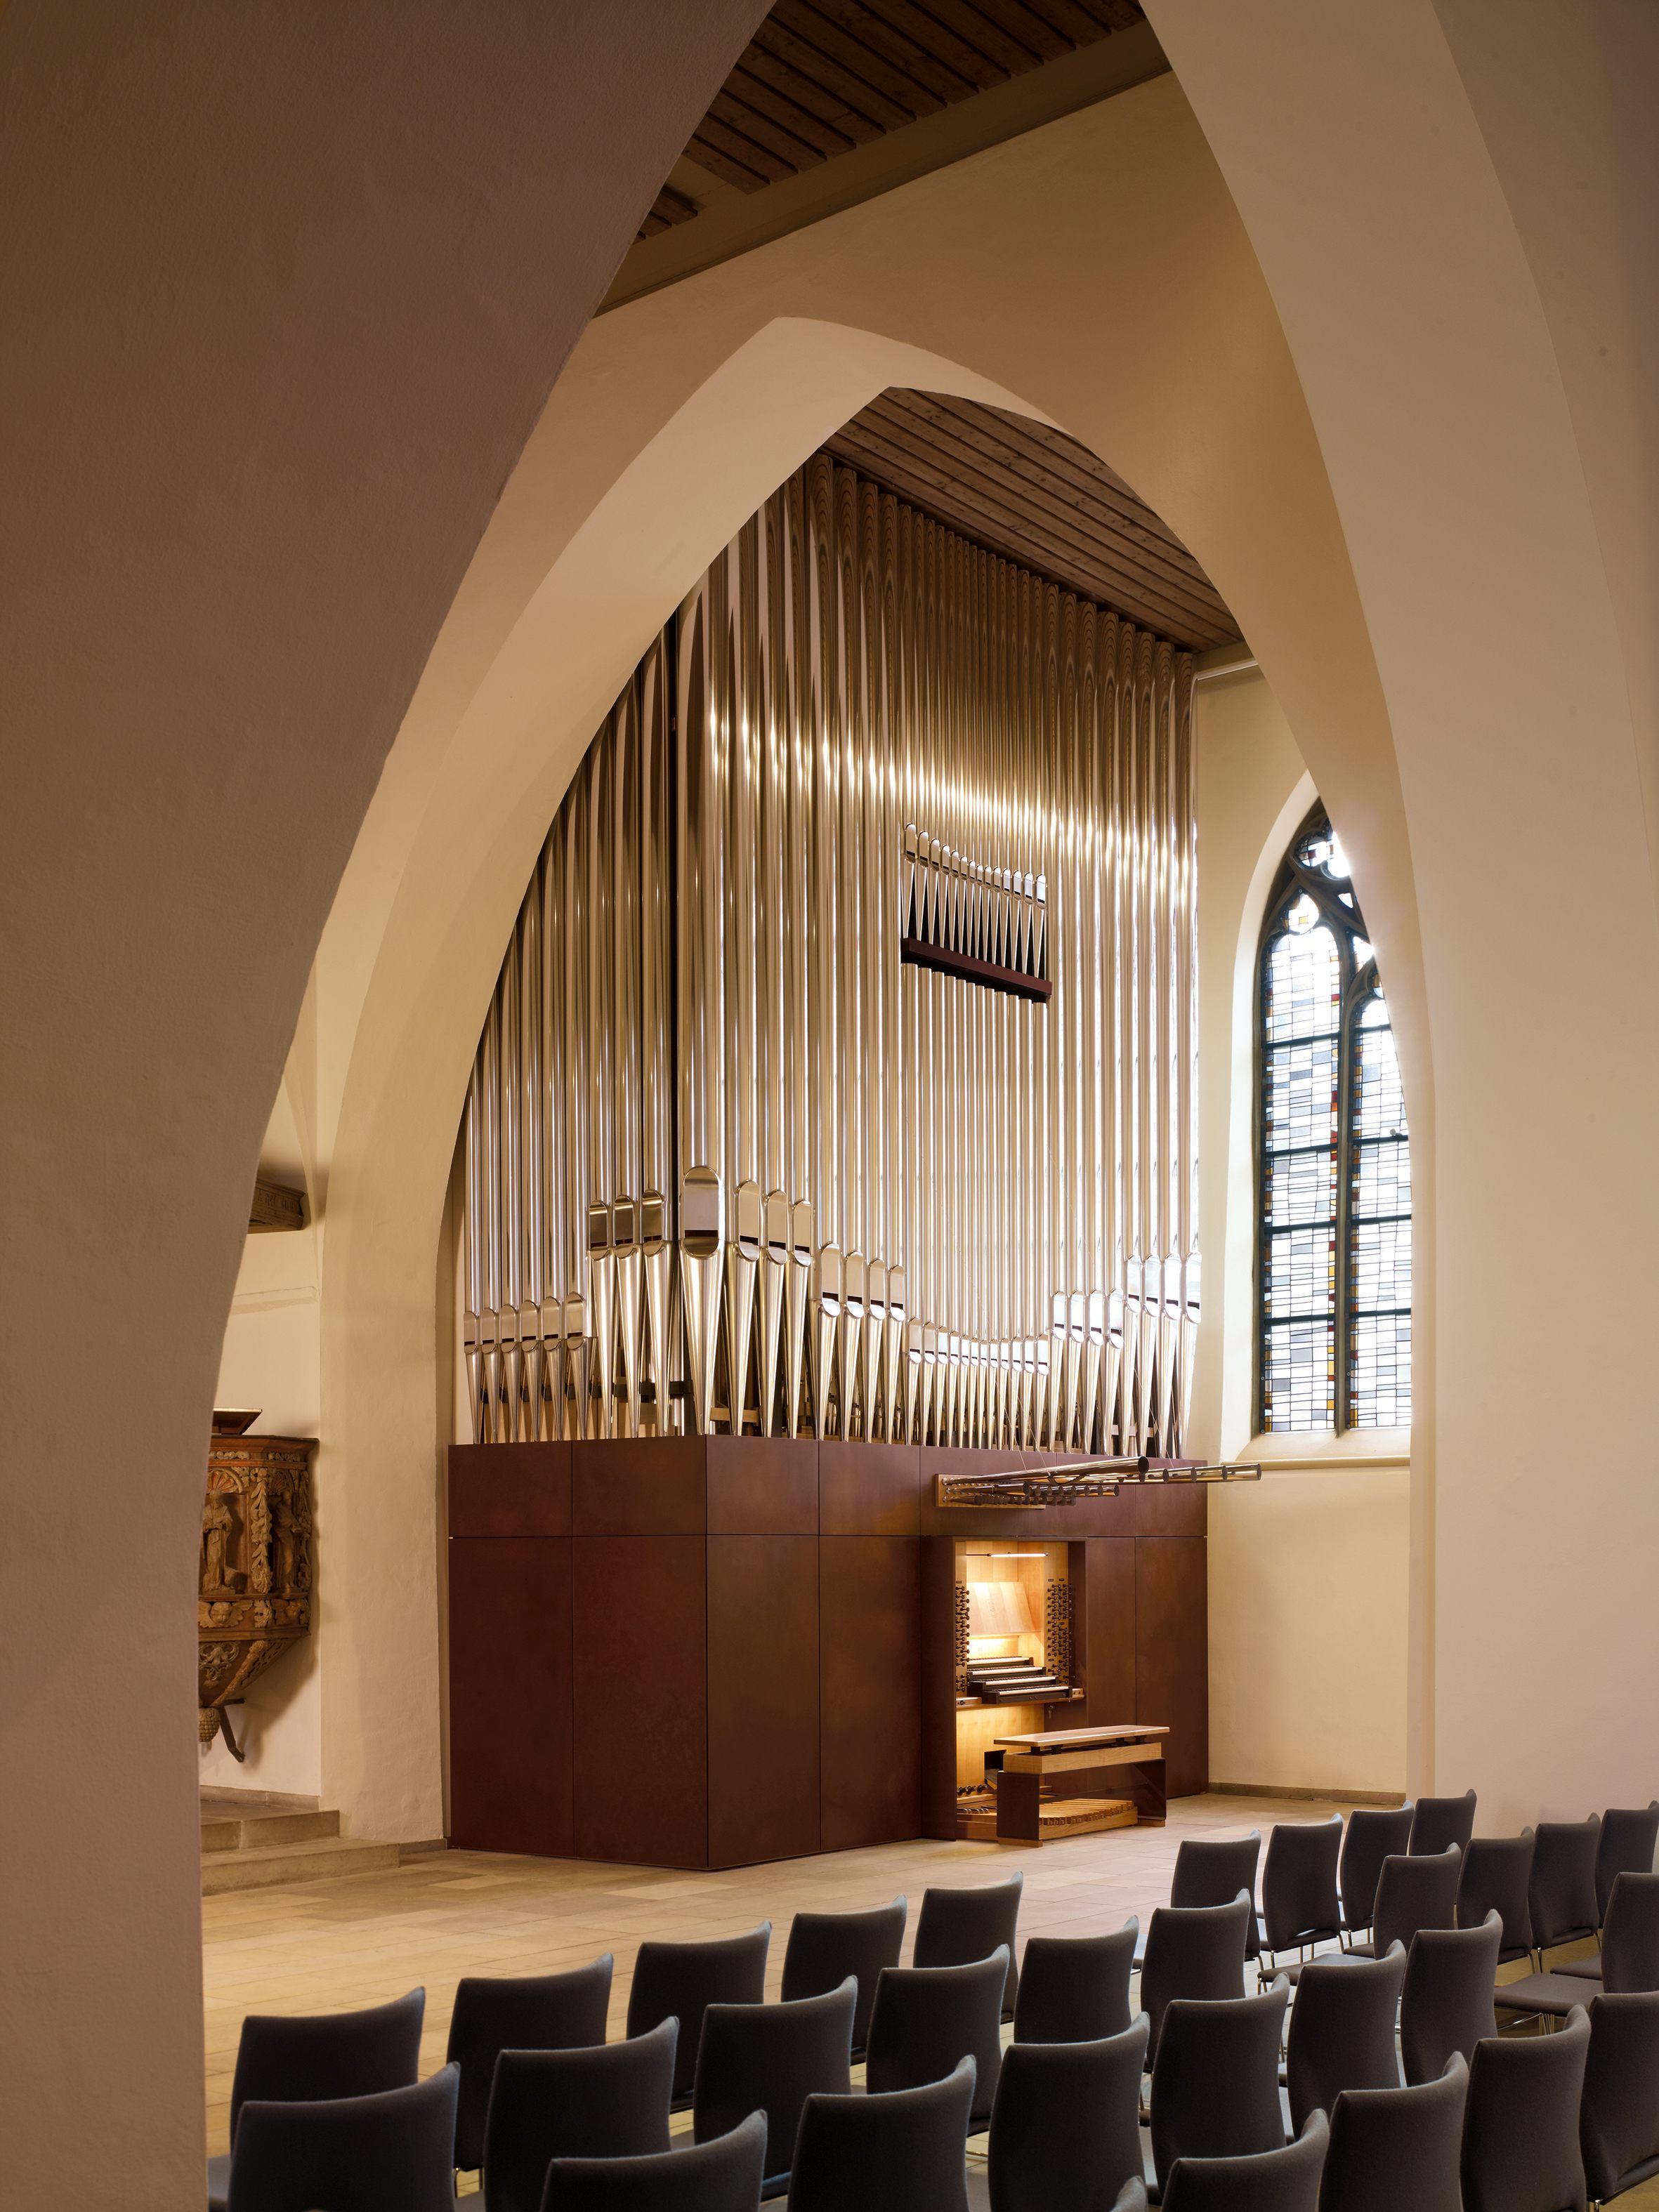 Orgelseite neu